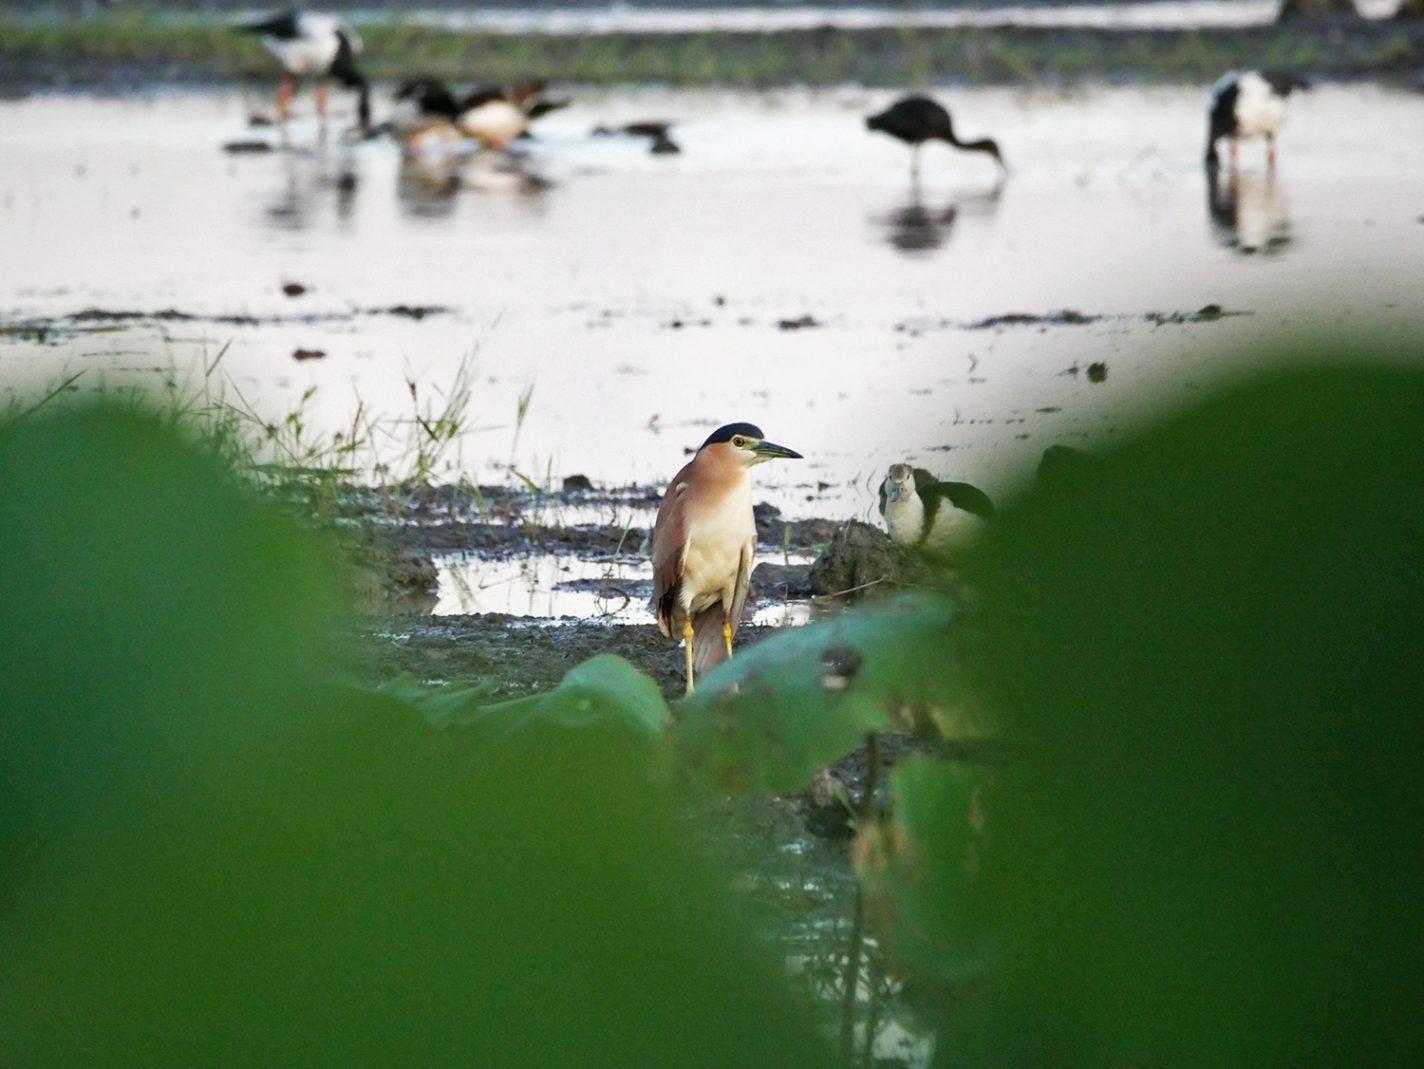 Wetland vol met prachtige vogels